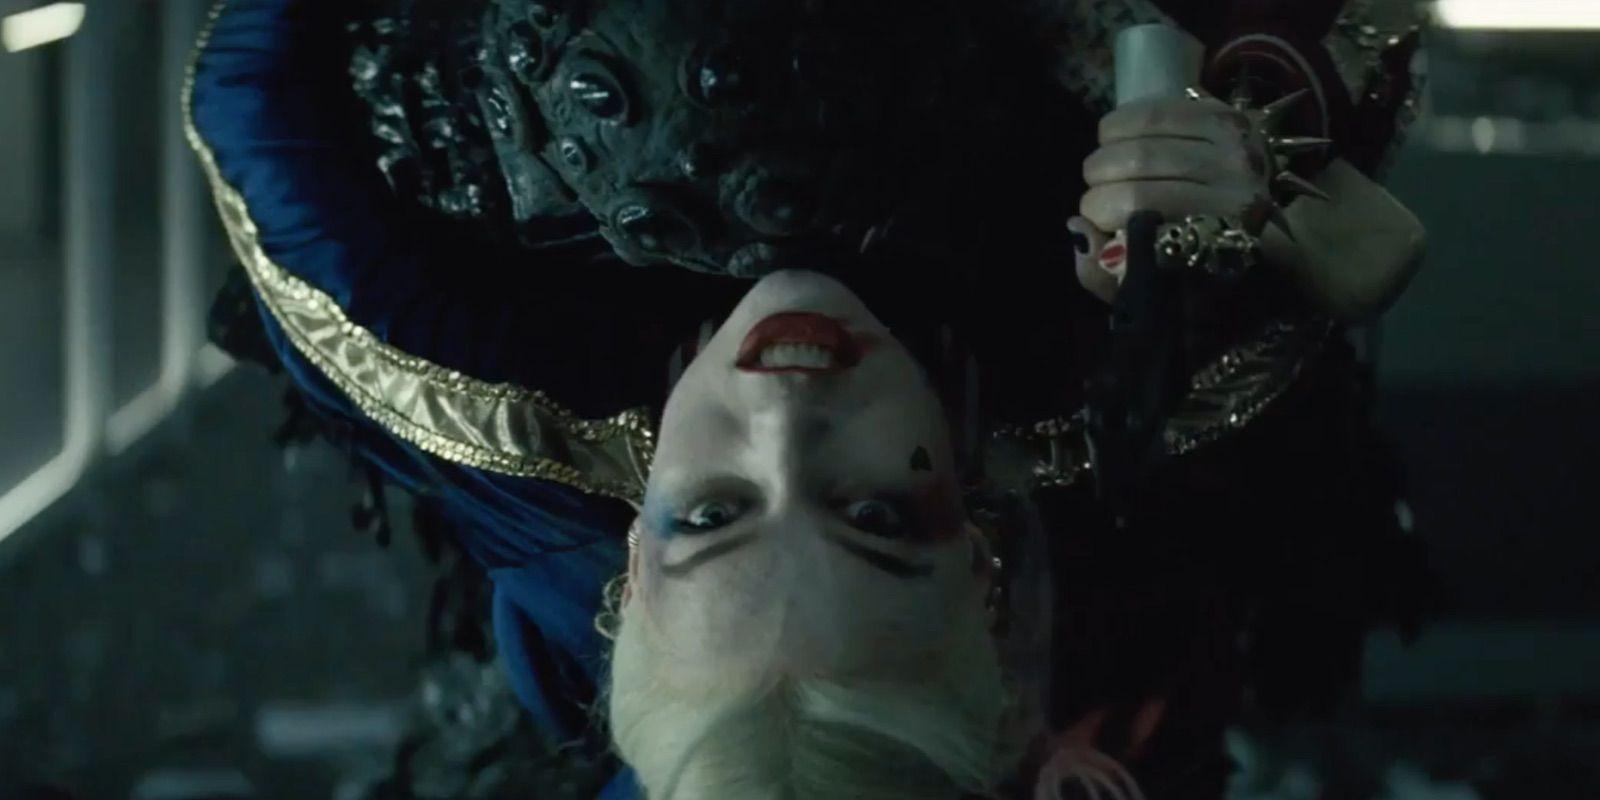 http://screenrant.com/wp-content/uploads/Harley-Quinn-Suicide-Squad-MTV-Trailer.jpg